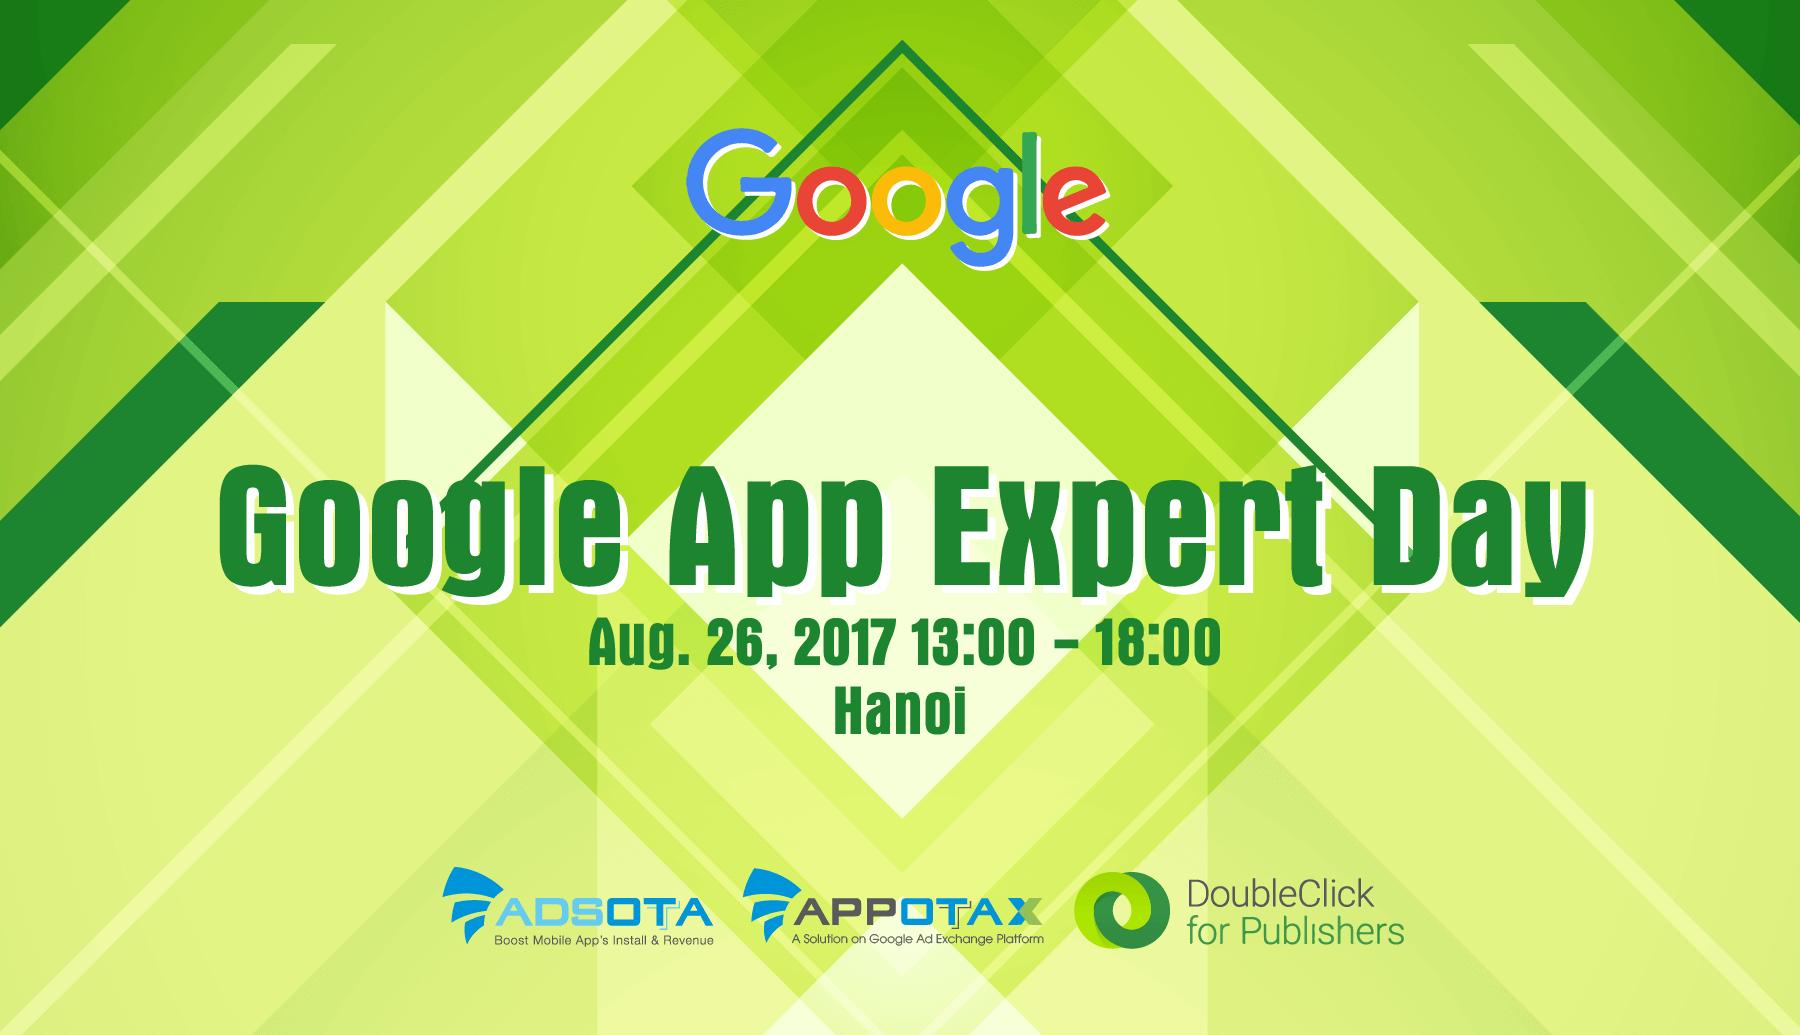 Google app expert day